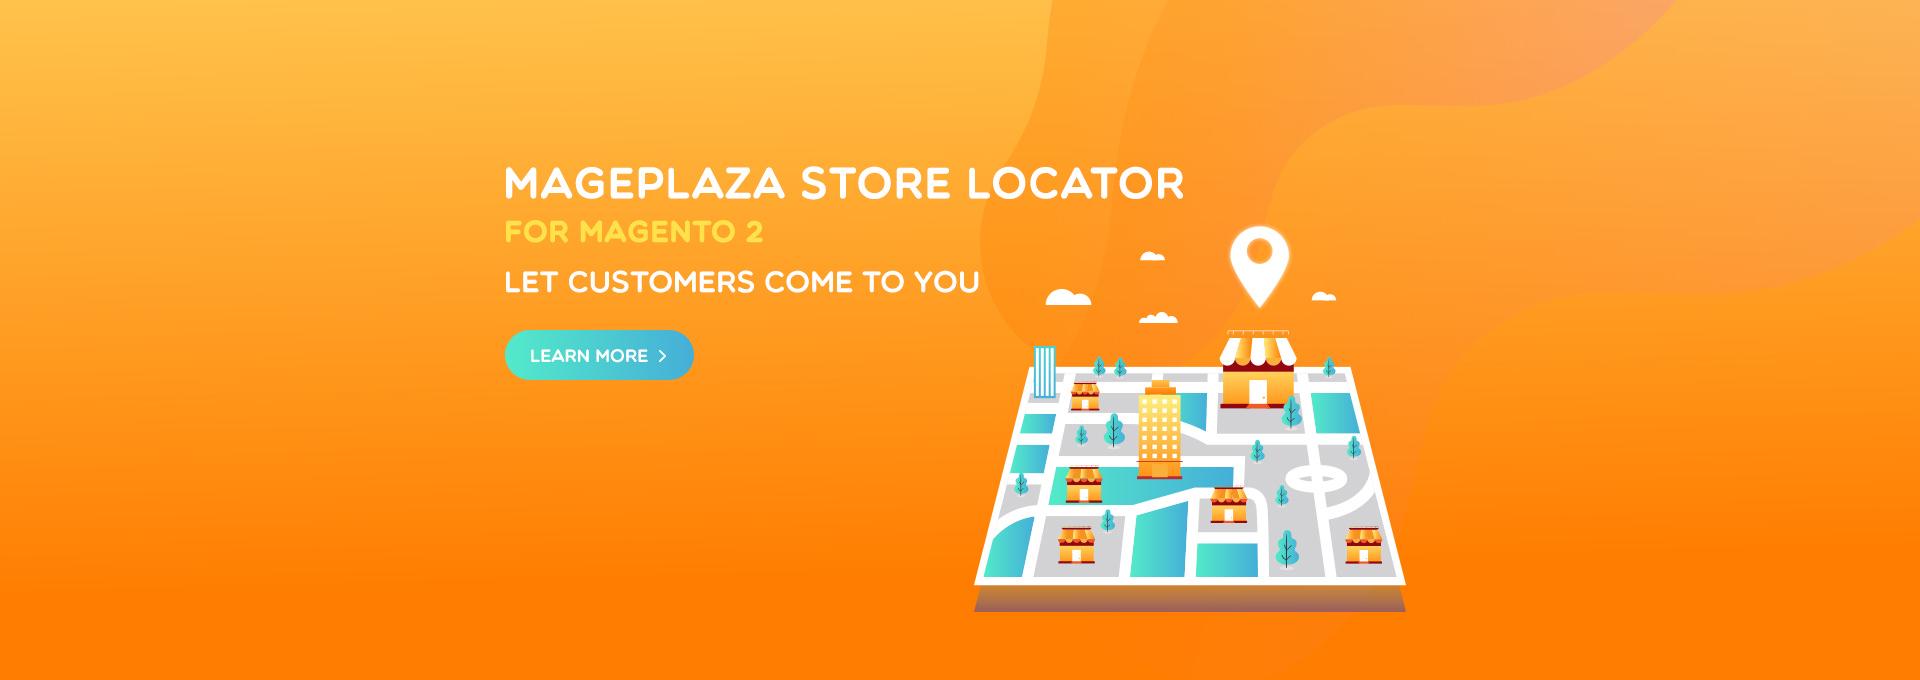 How to configure Store Locator in Magento 2